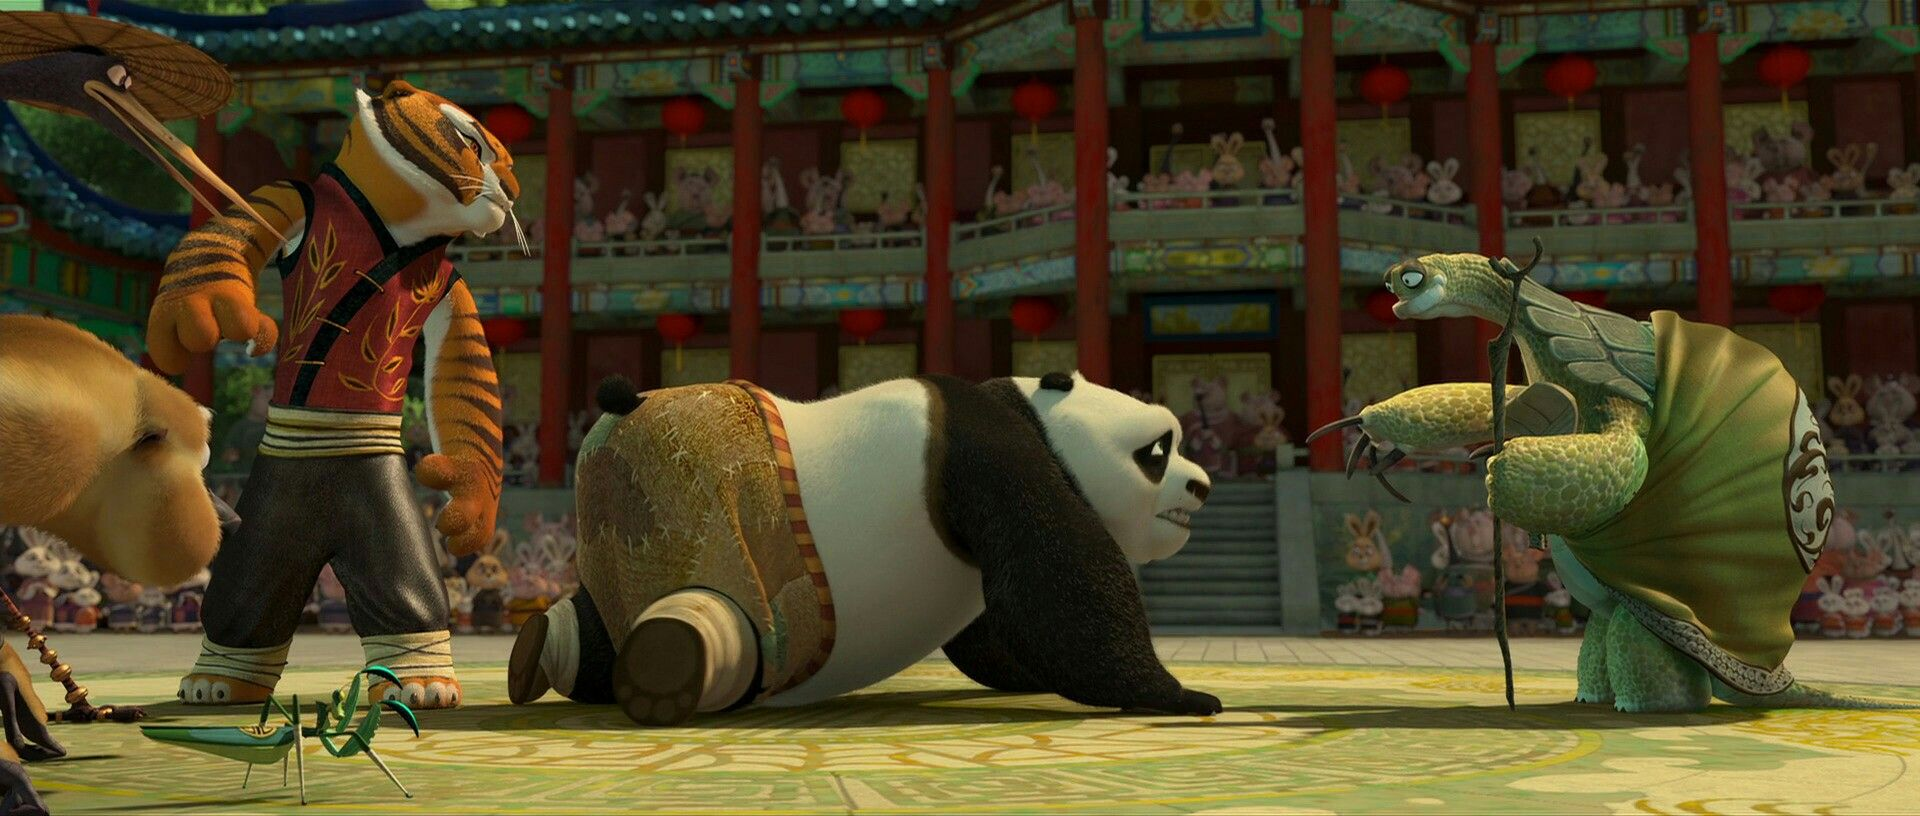 Pin by Art3mis Chase on kung fu panda Kung fu panda